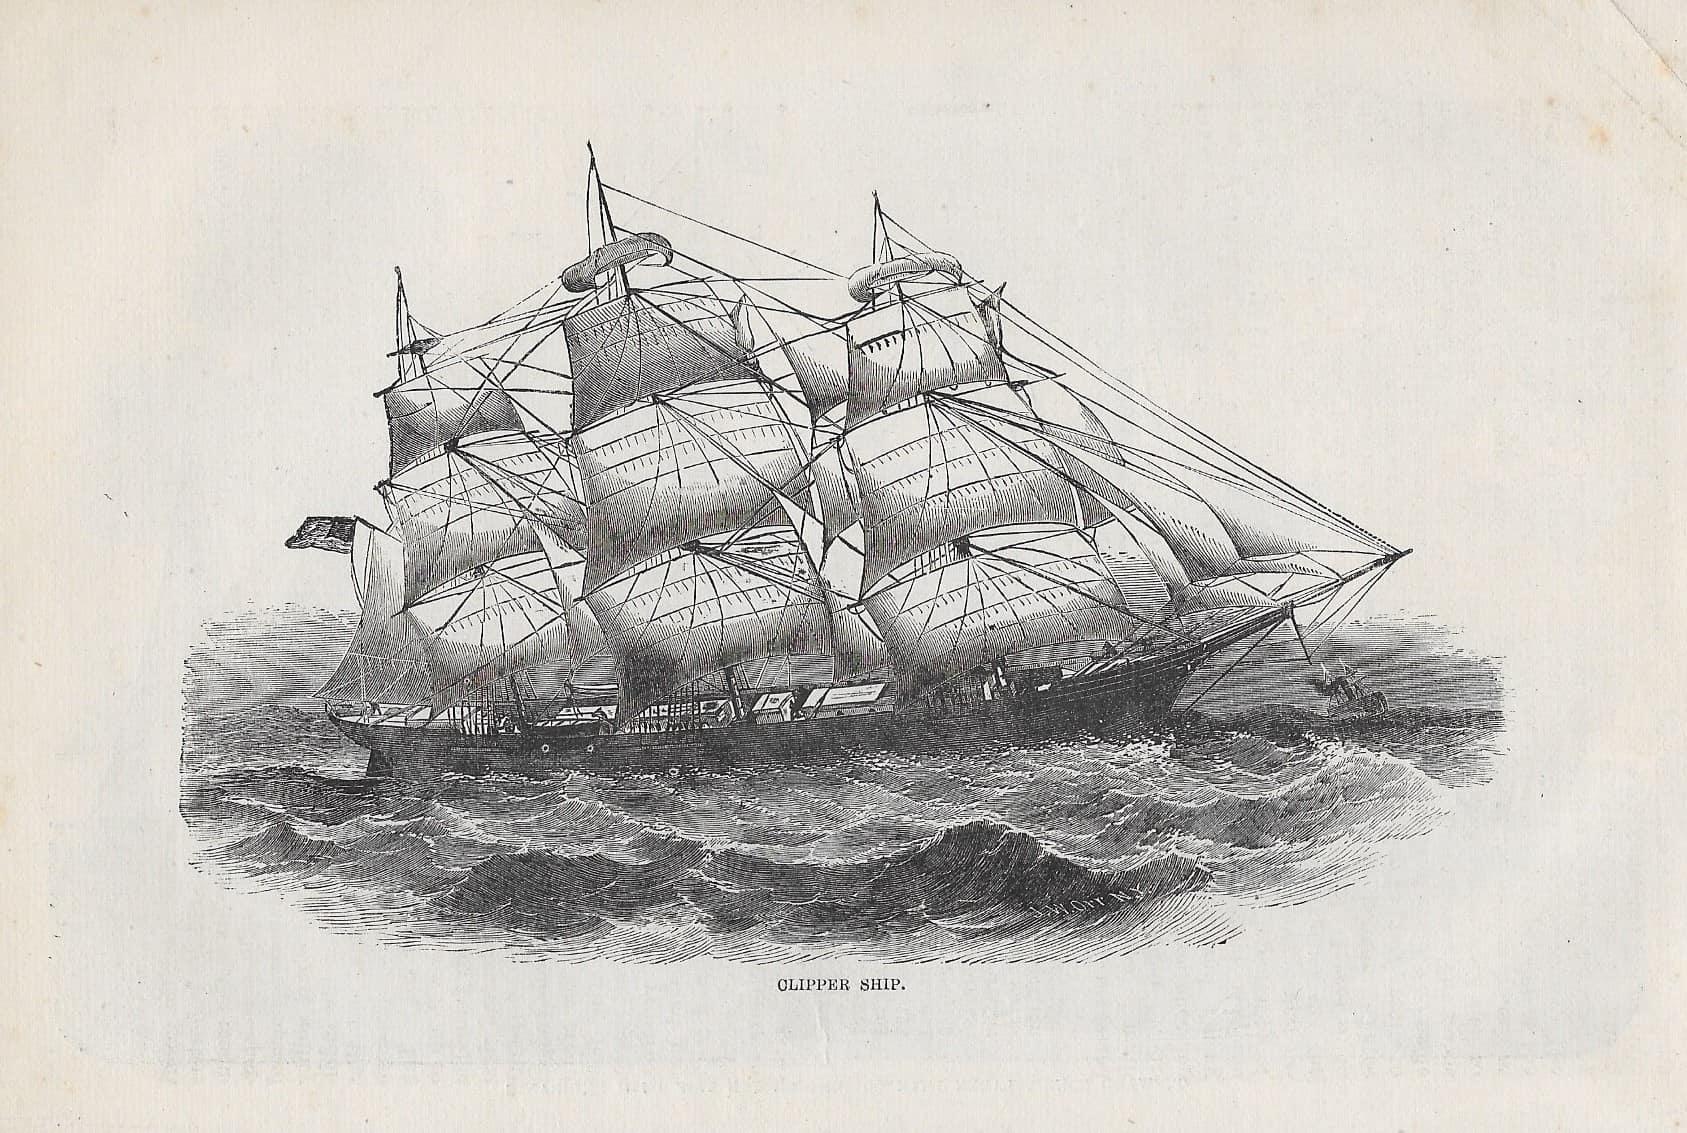 #4234b mid1800s Clipper Ship